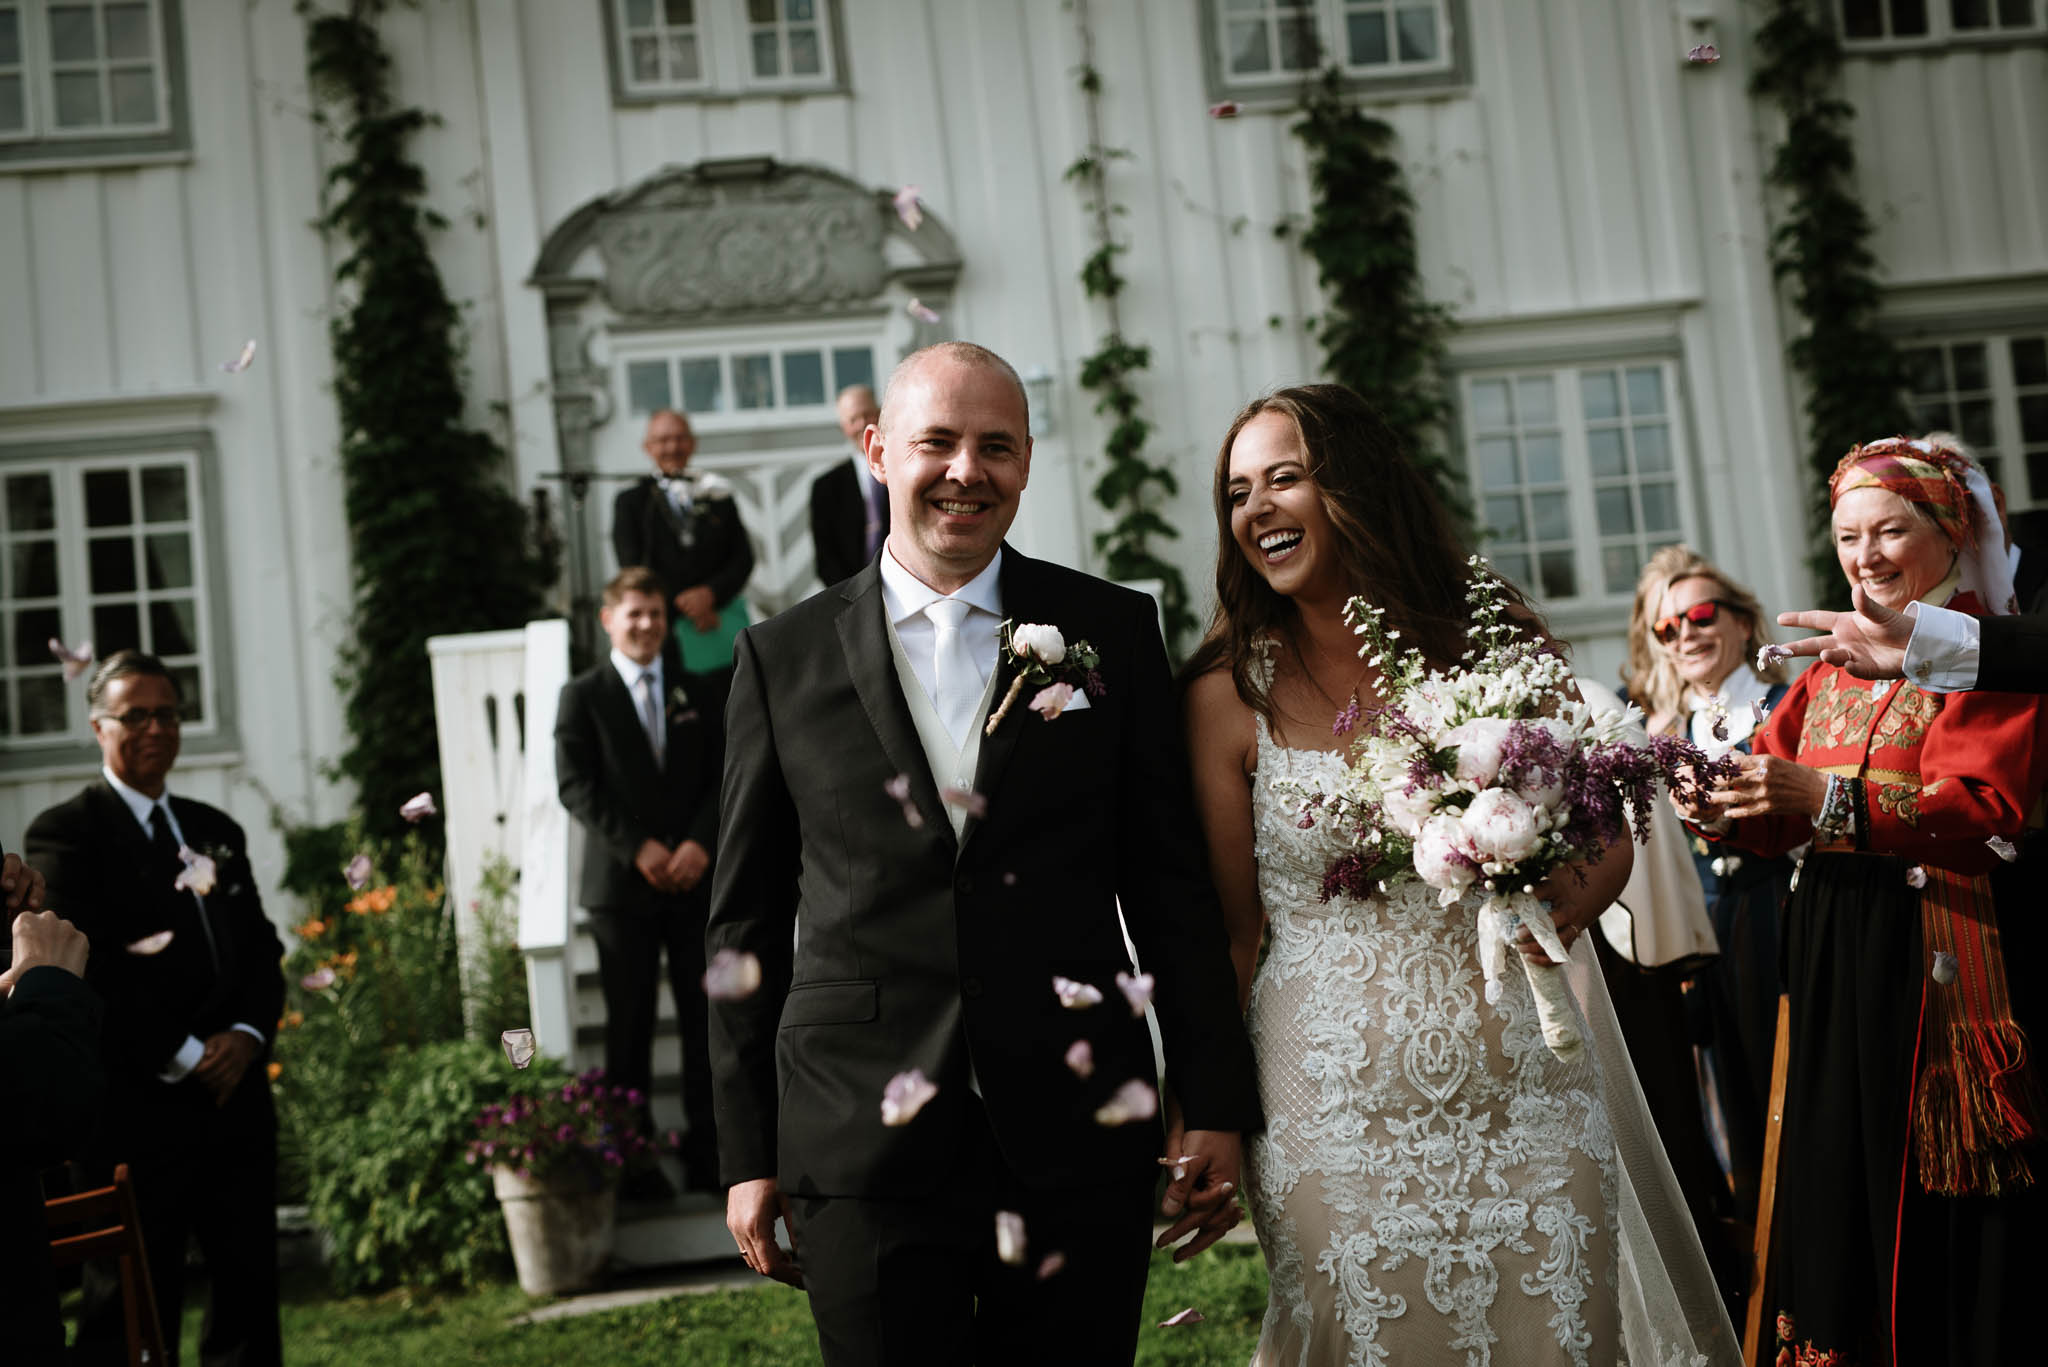 Bryllupsfotograf i Lofoten - wedding photographer Lofoten - bryllup harstad-24.jpg